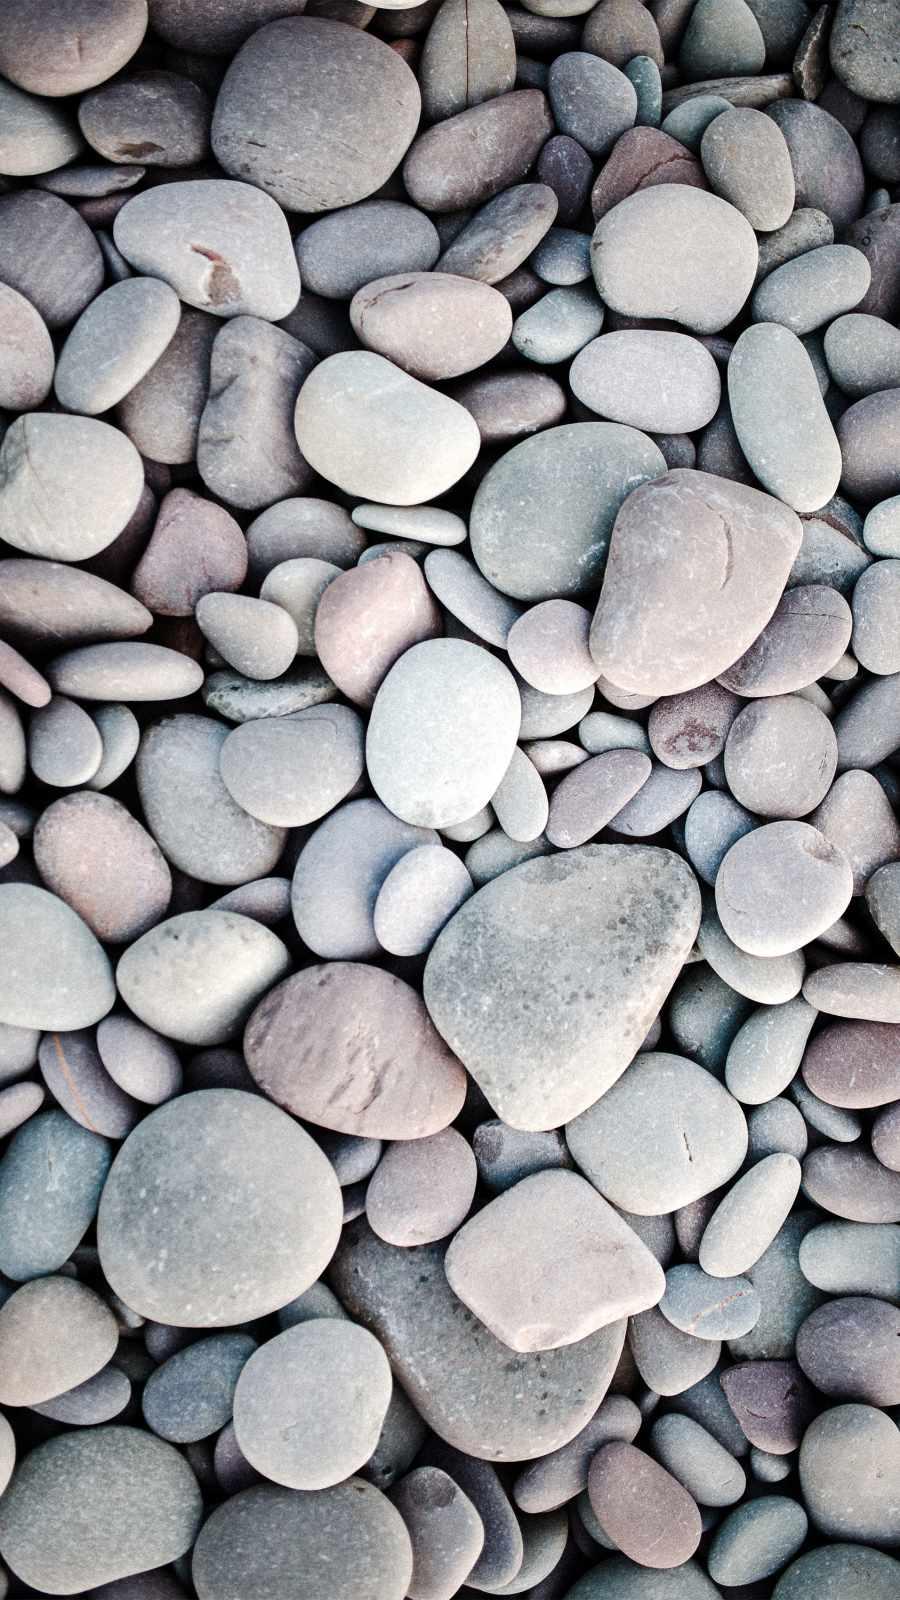 Stones Pebbles iPhone Wallpaper